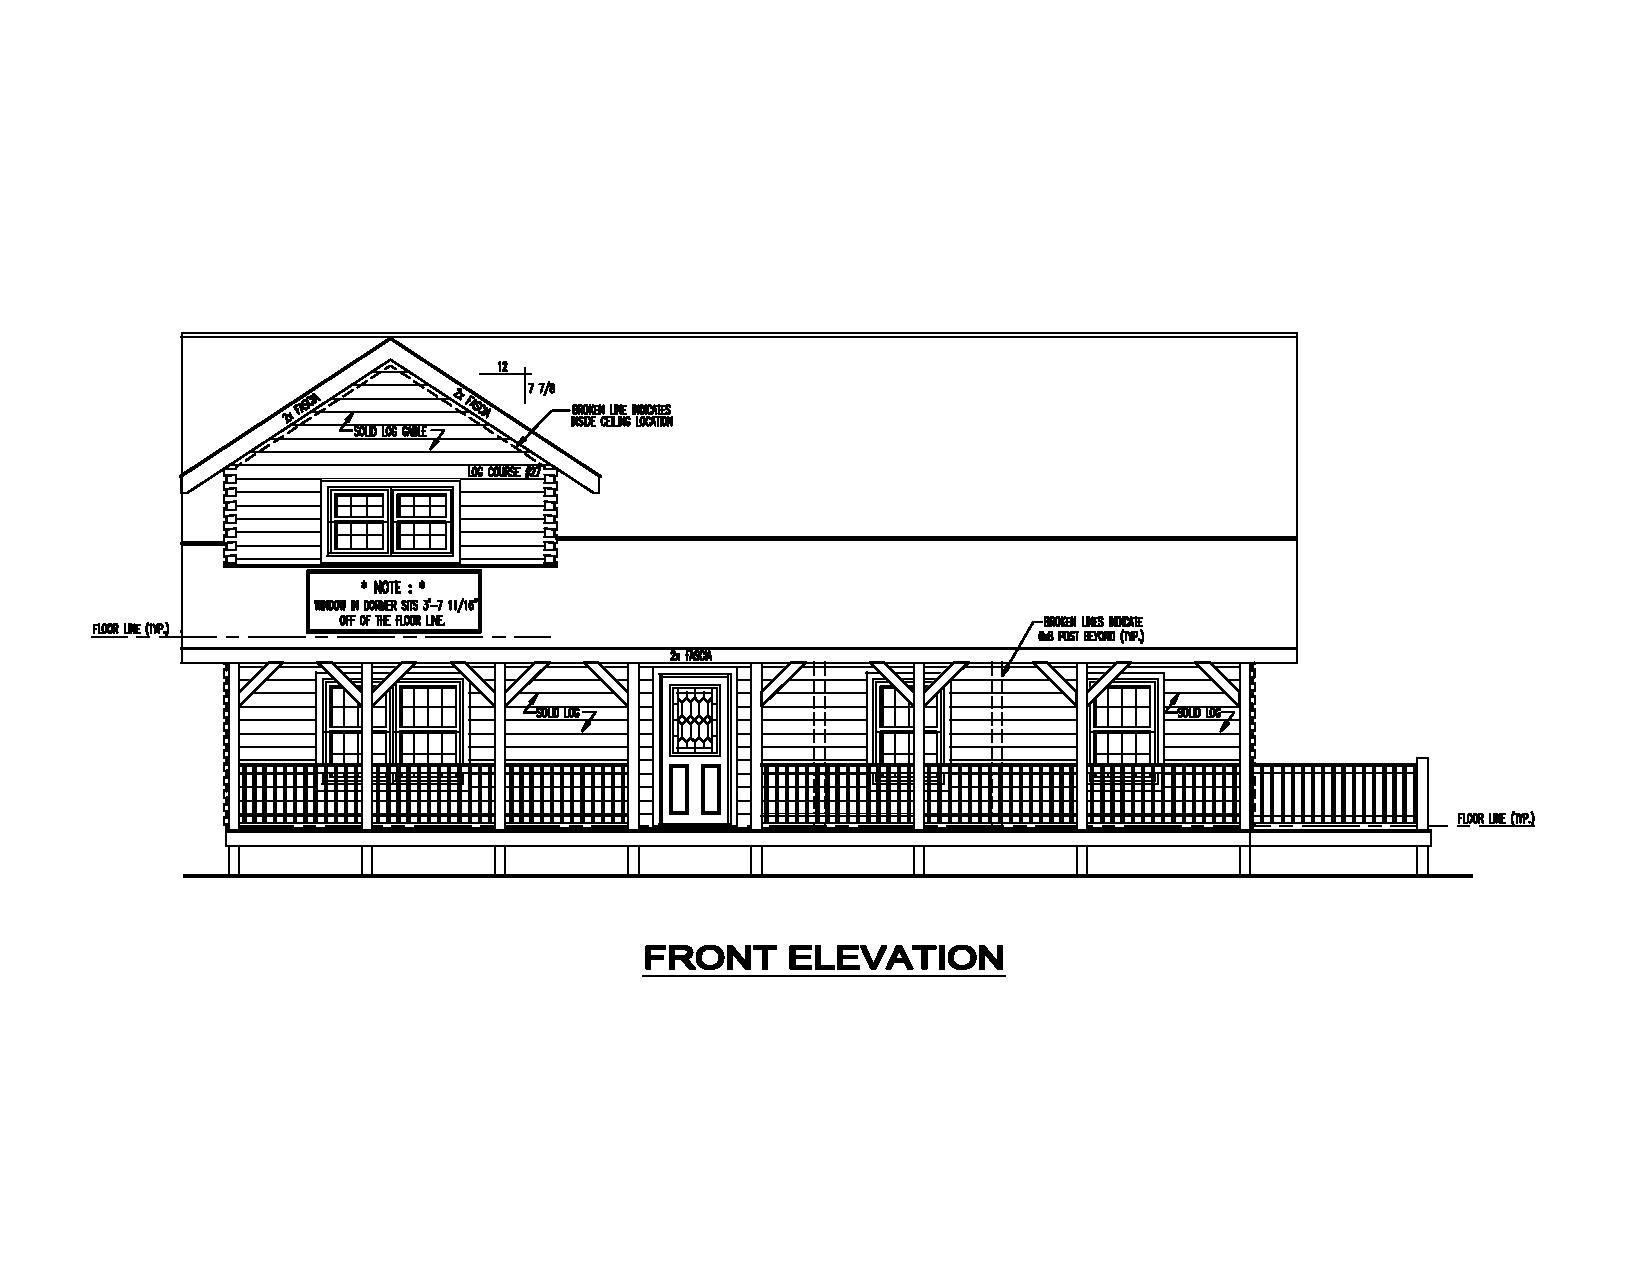 Keystone Elevation : Keystone i floor plans and elevations morningdale log